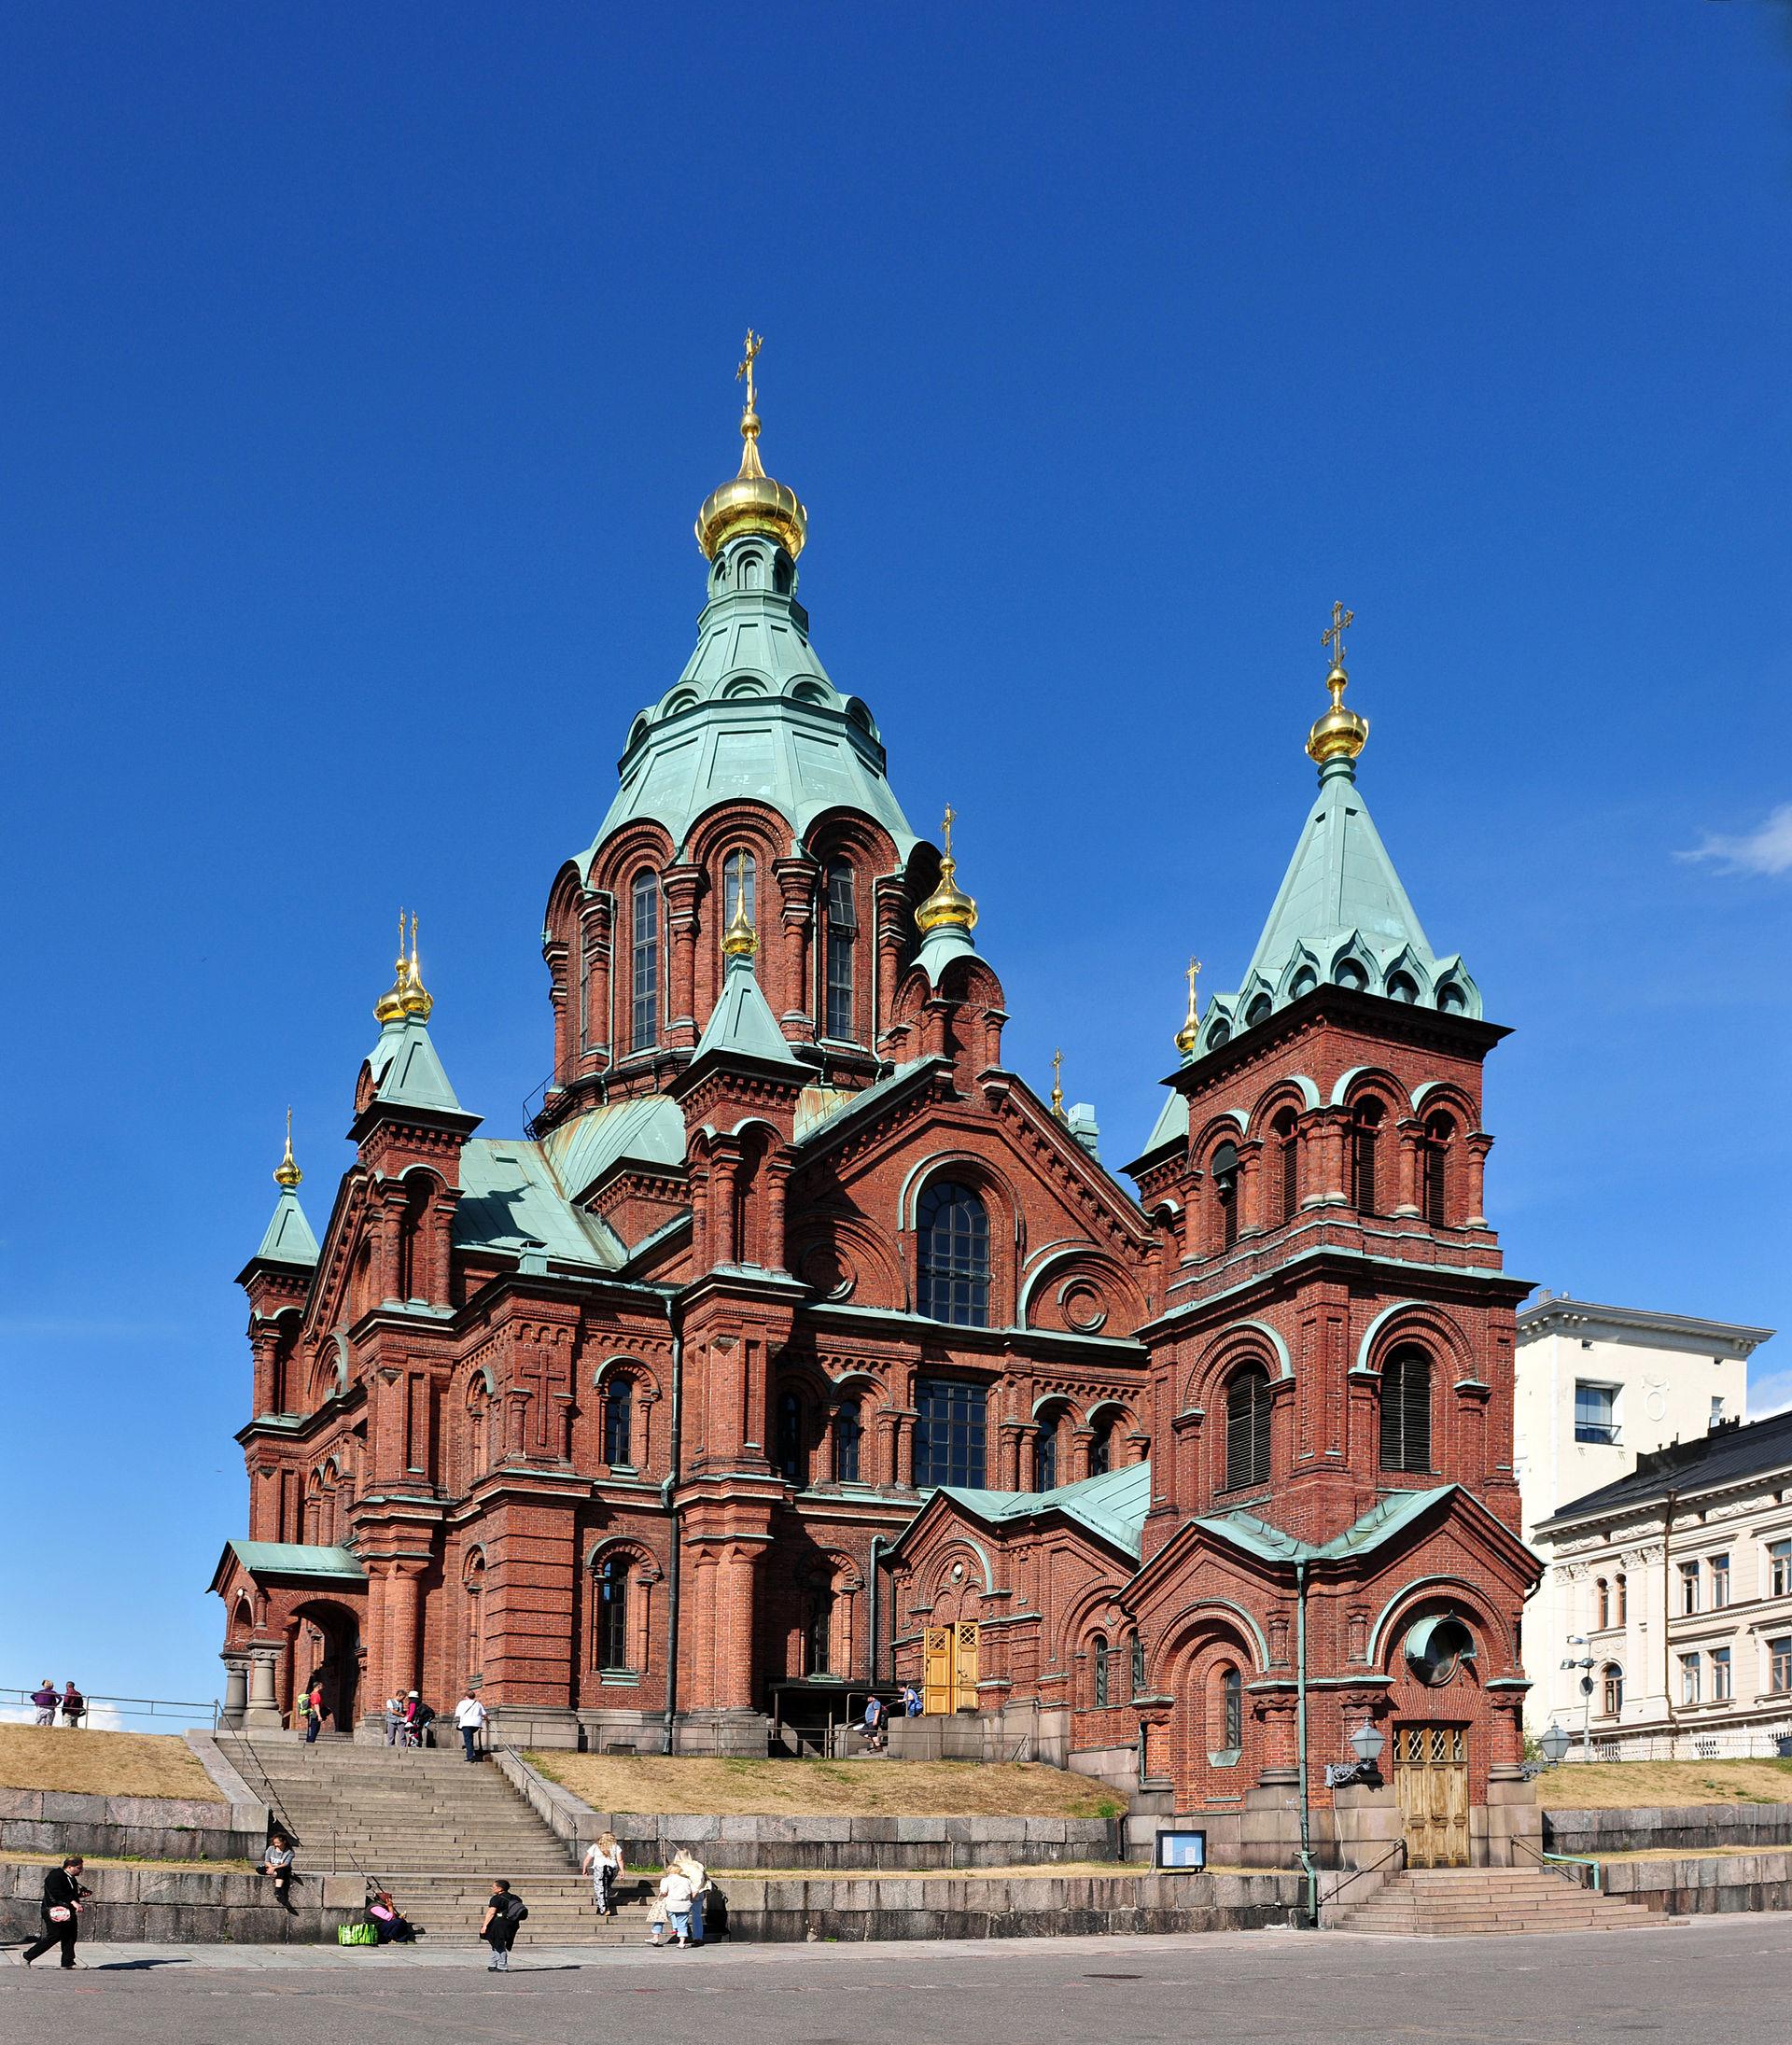 Oespenski-kathedraal (Helsinki) - Wikipedia